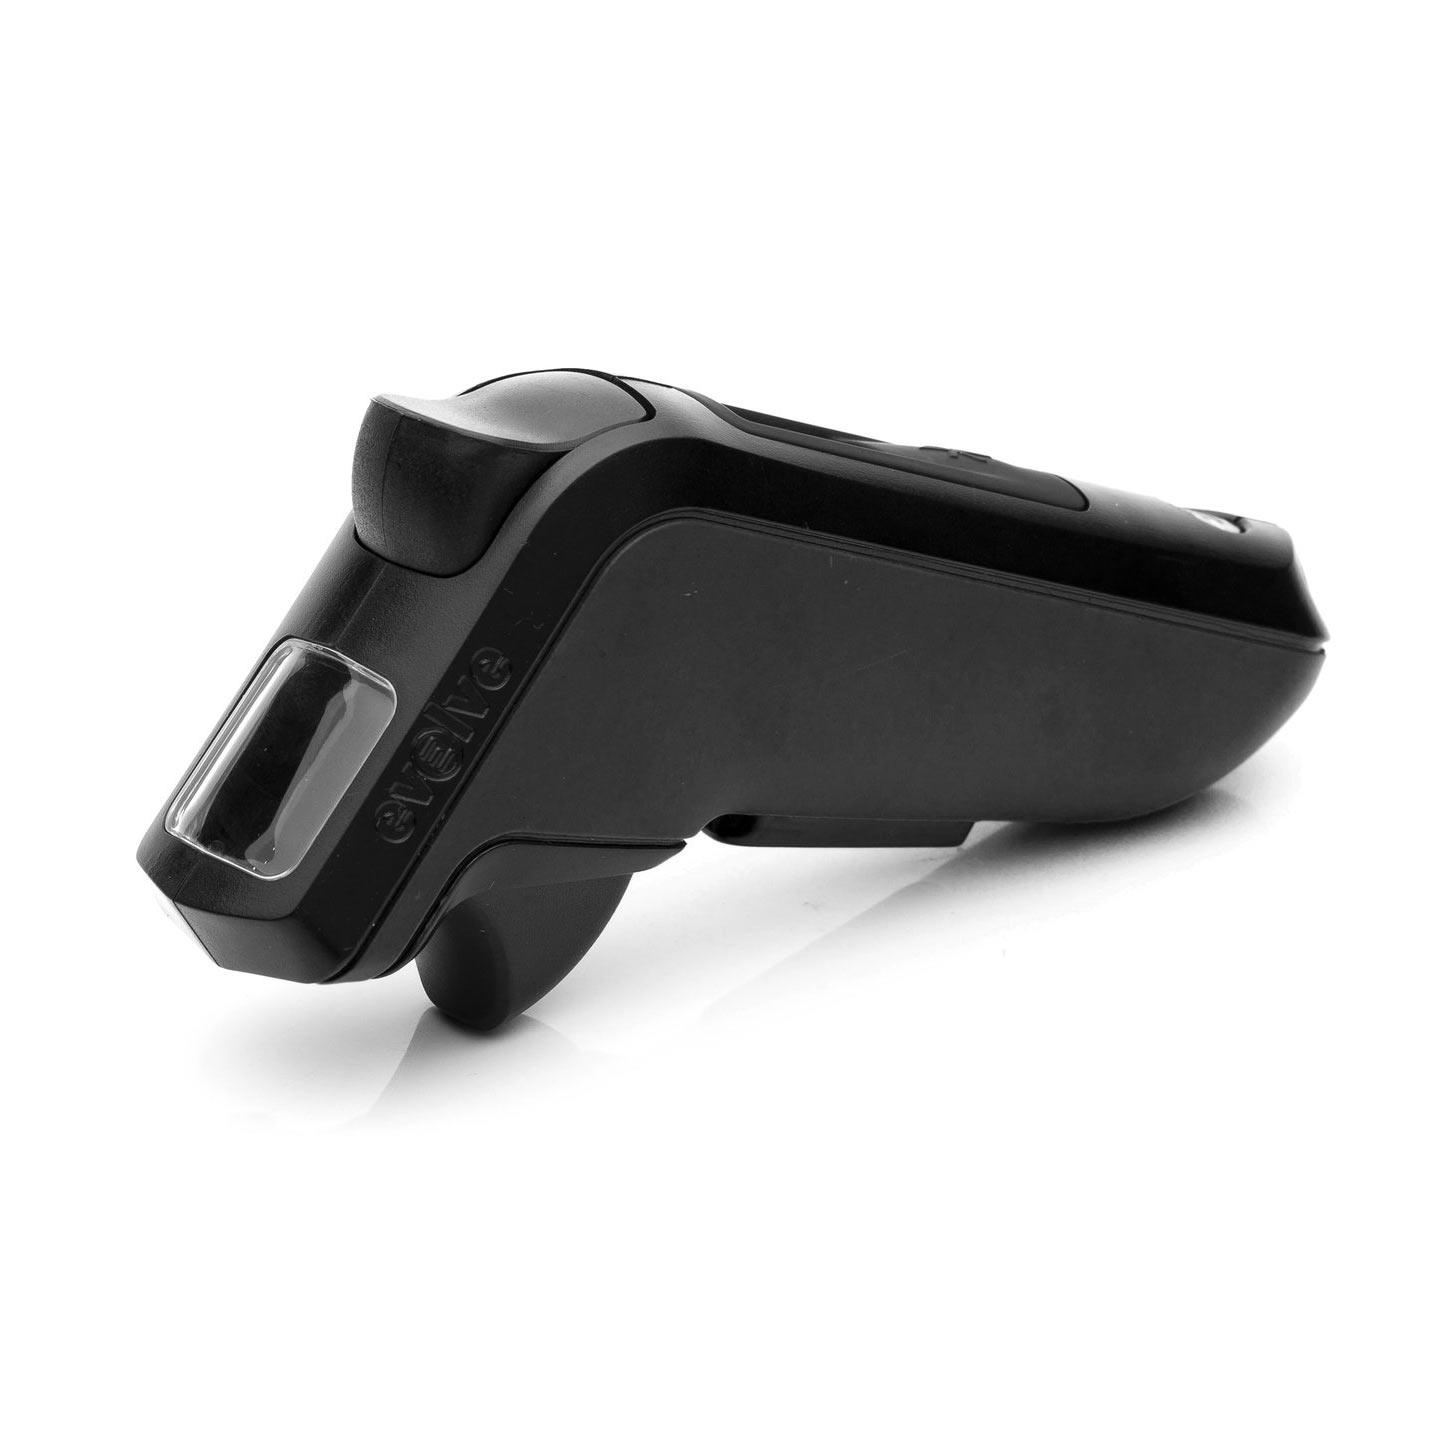 Evolve GTR BlueTooth Remote Control Canada Online Sales Pickup Vancouver